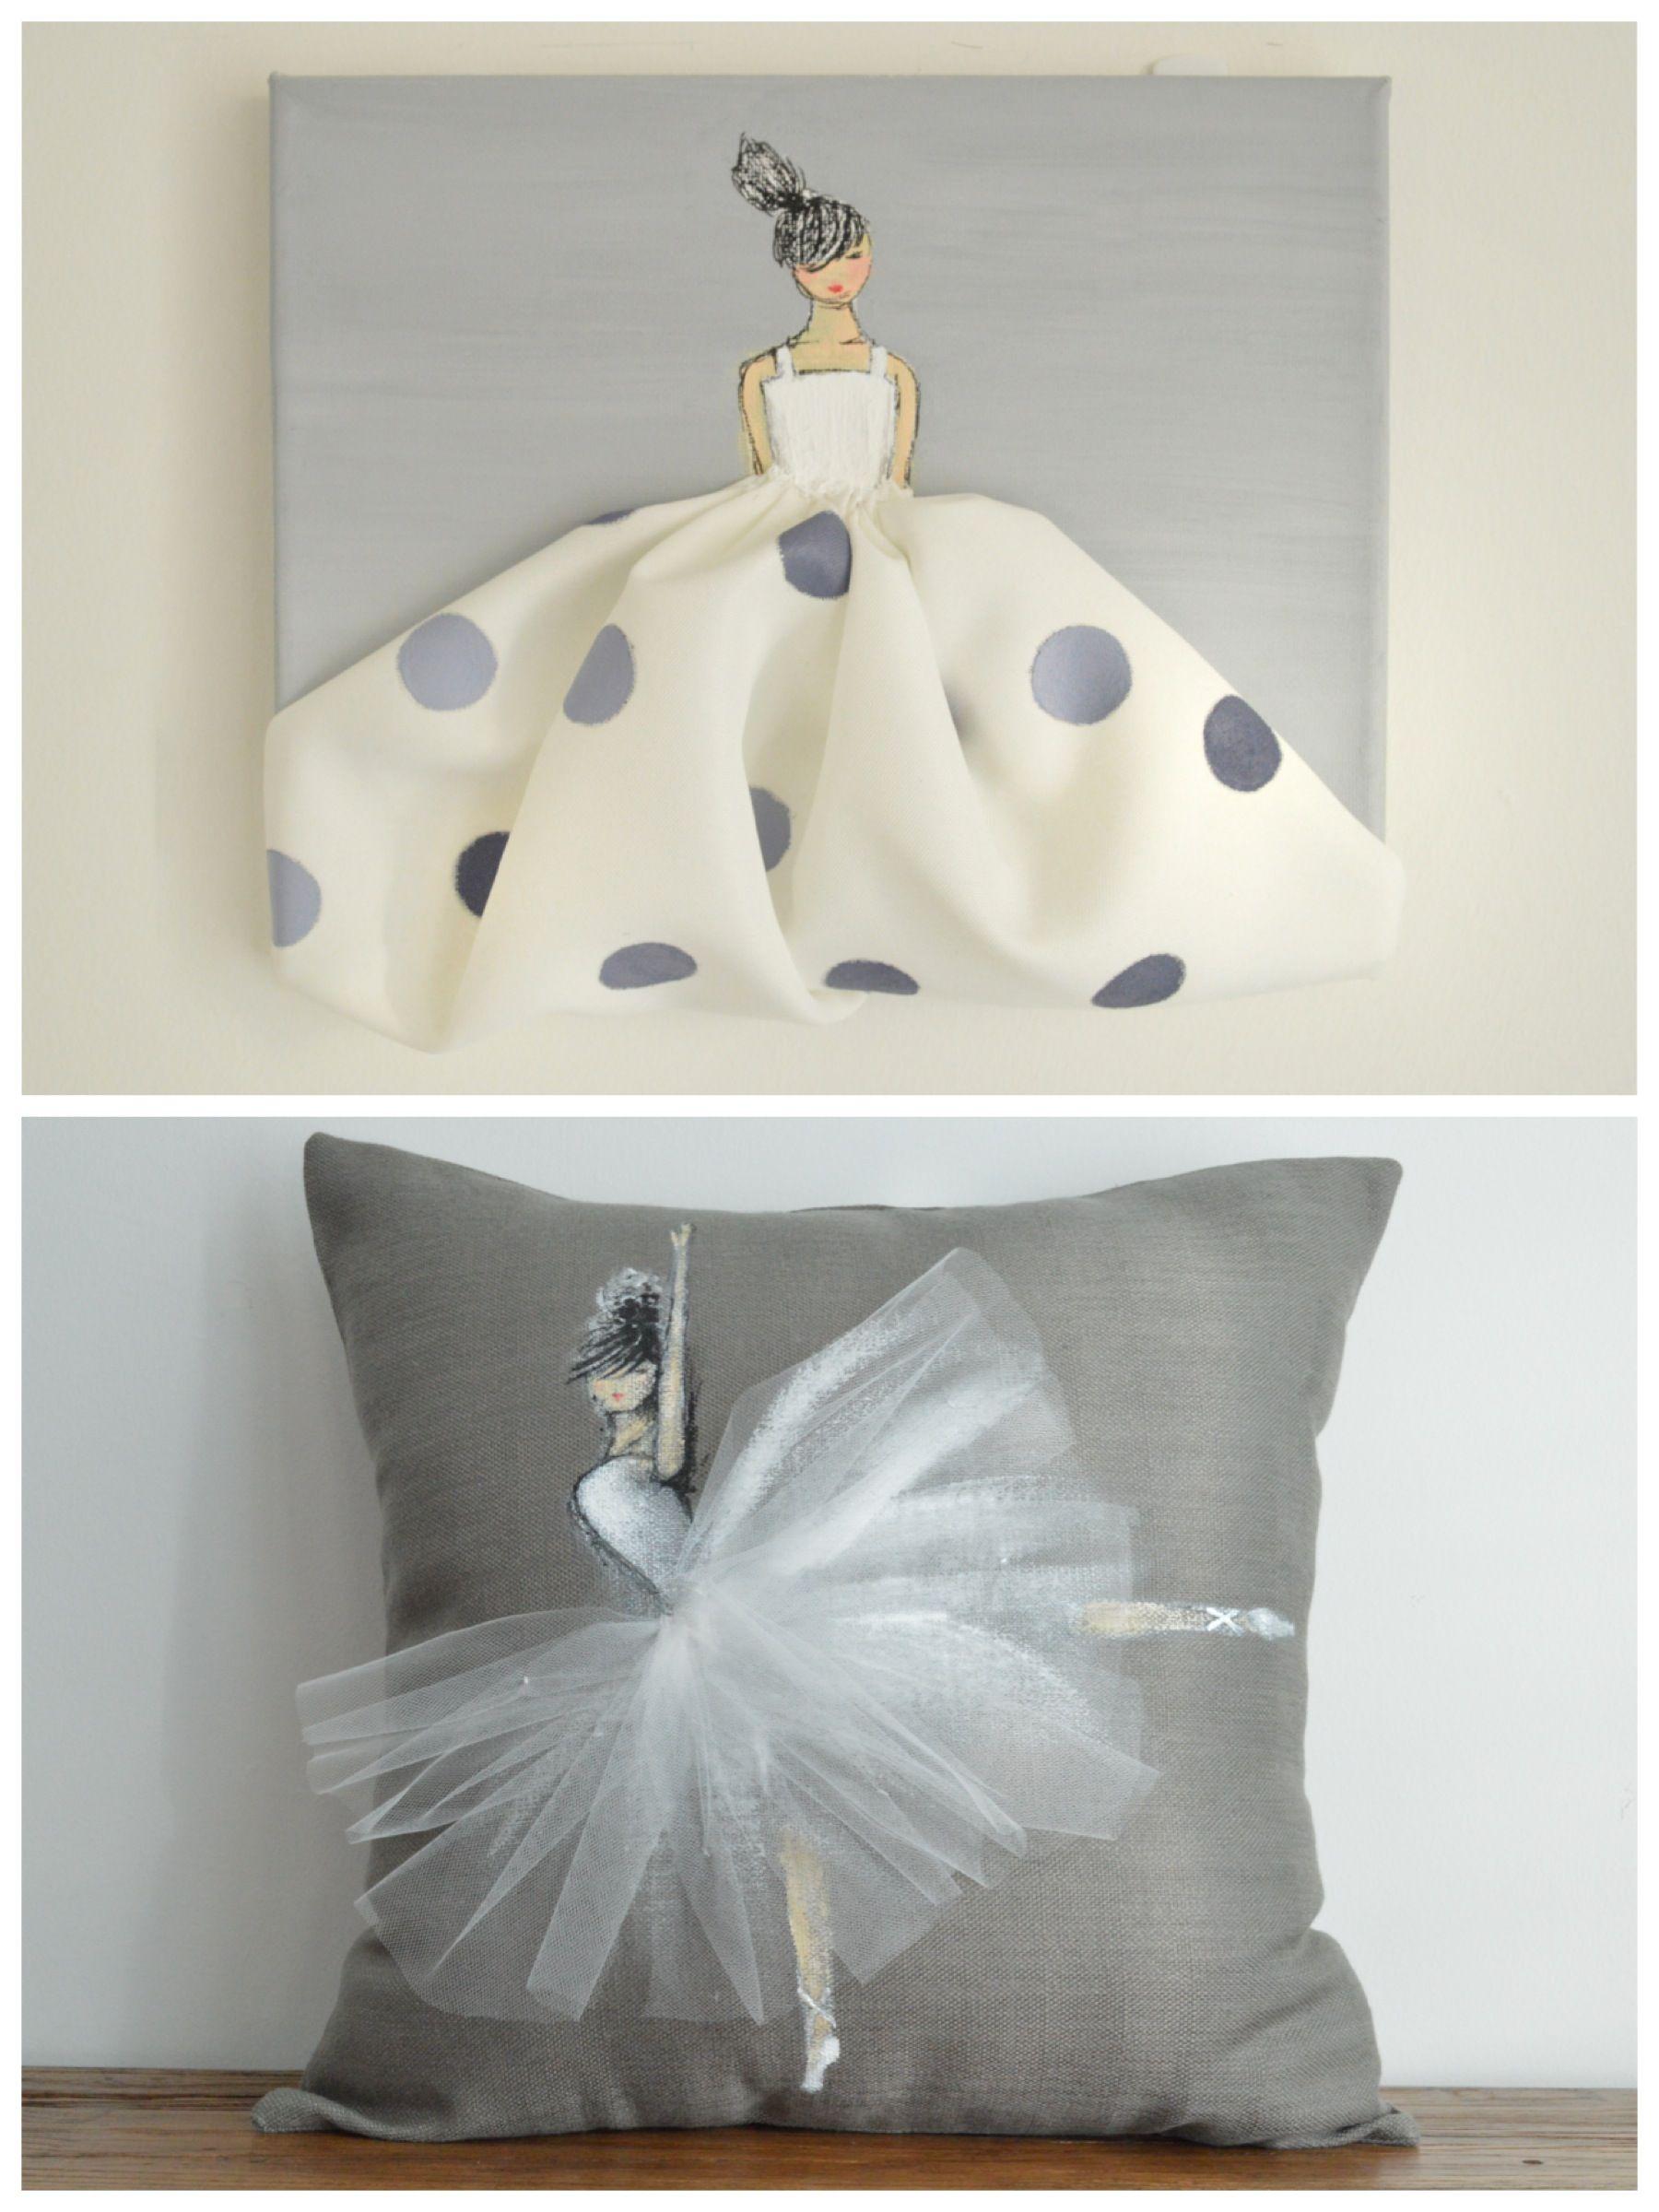 Shenasiconcept custom designed canvas u cushioncover for little